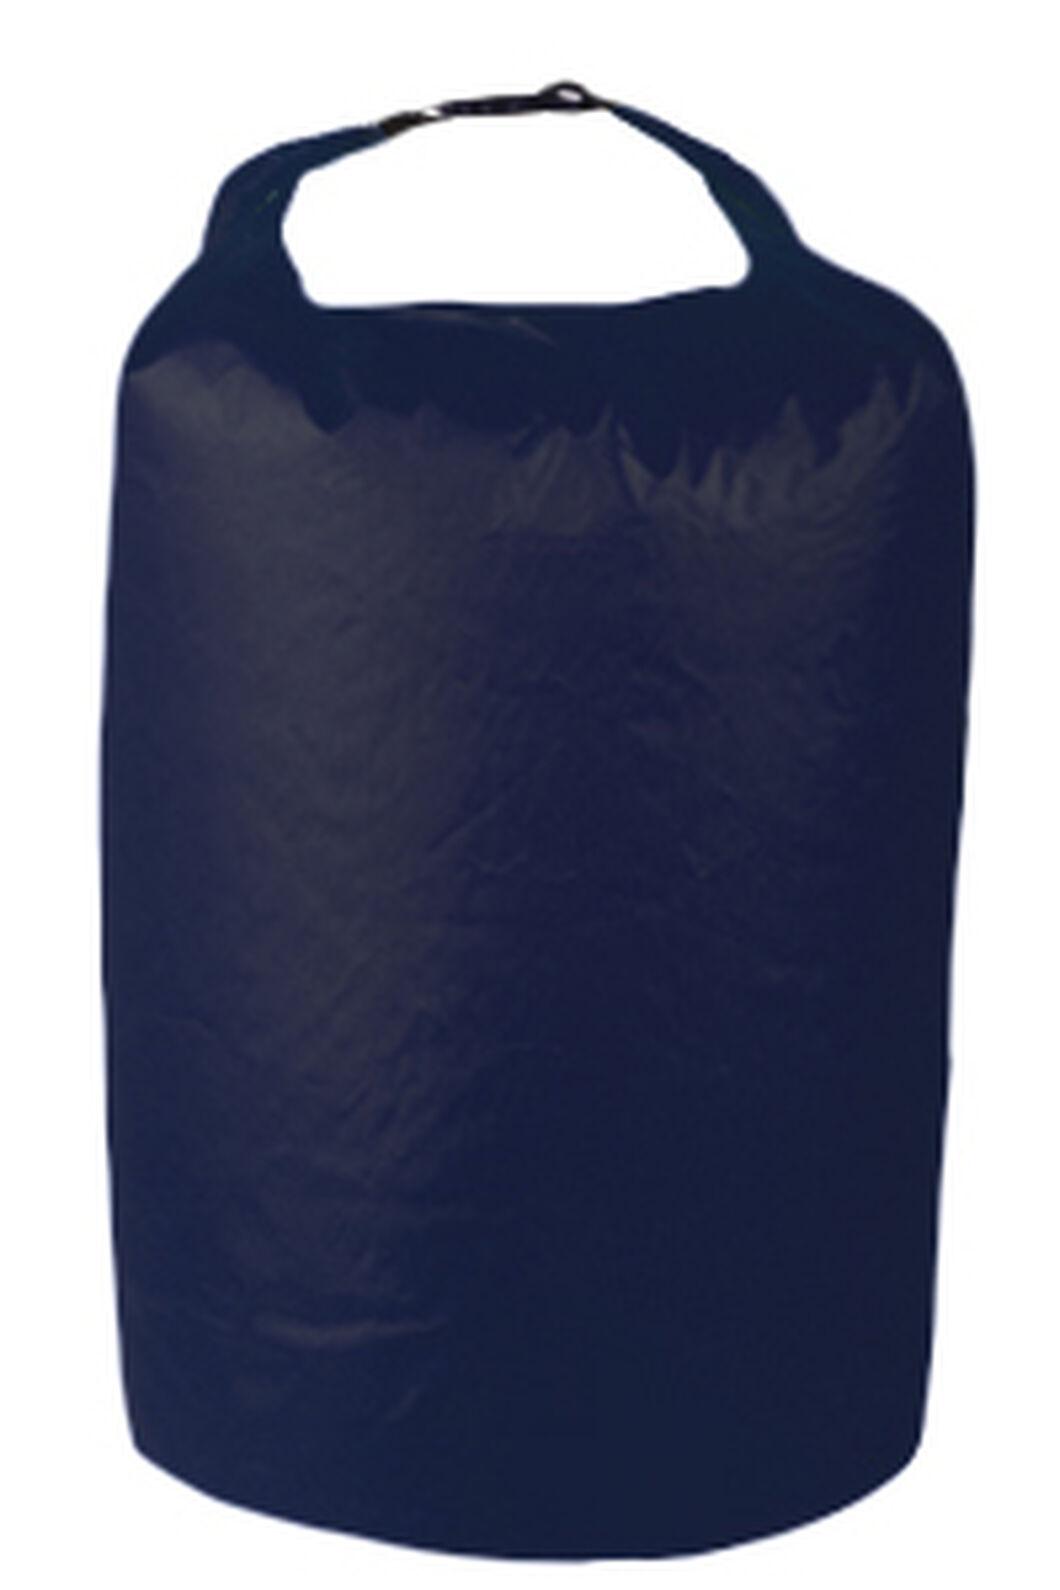 Macpac Ultralight Dry Bag 5 L, Sodalite Blue, hi-res